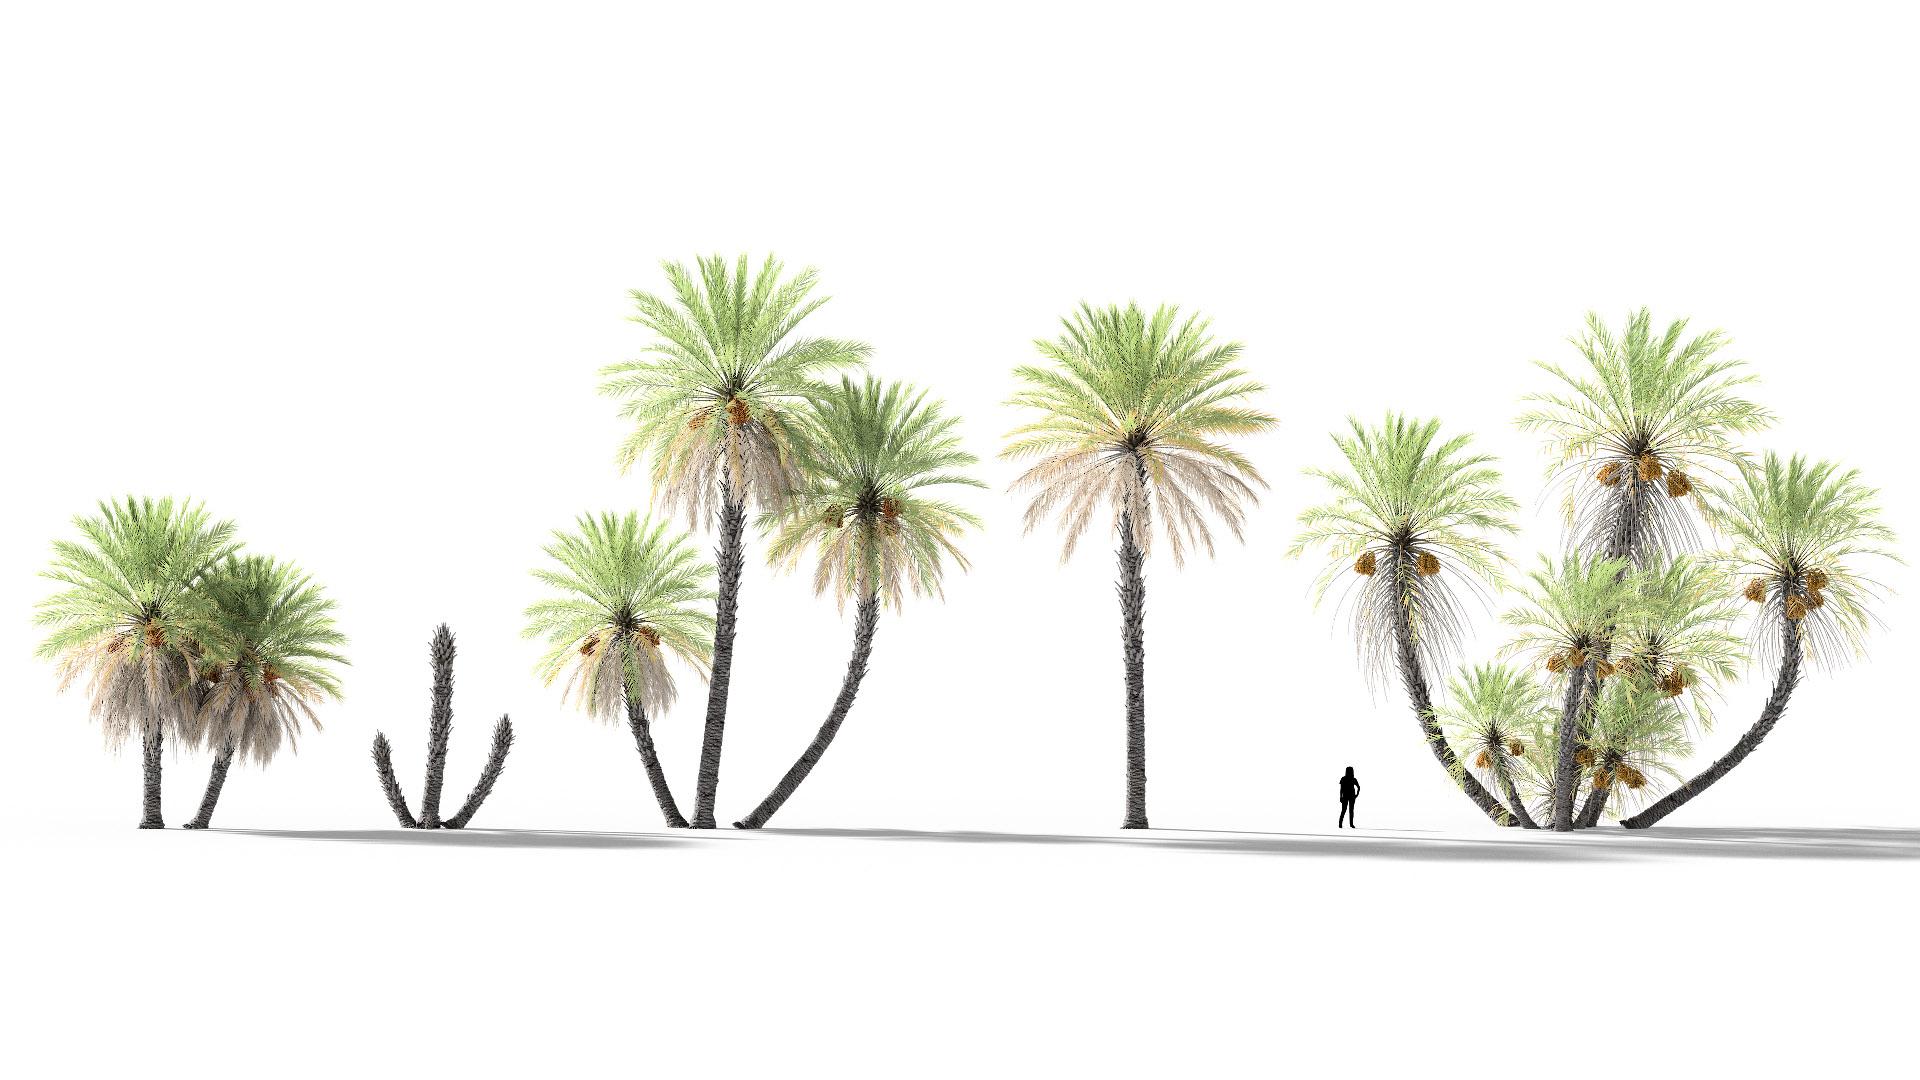 3D model of the Date palm Phoenix dactylifera published parameters